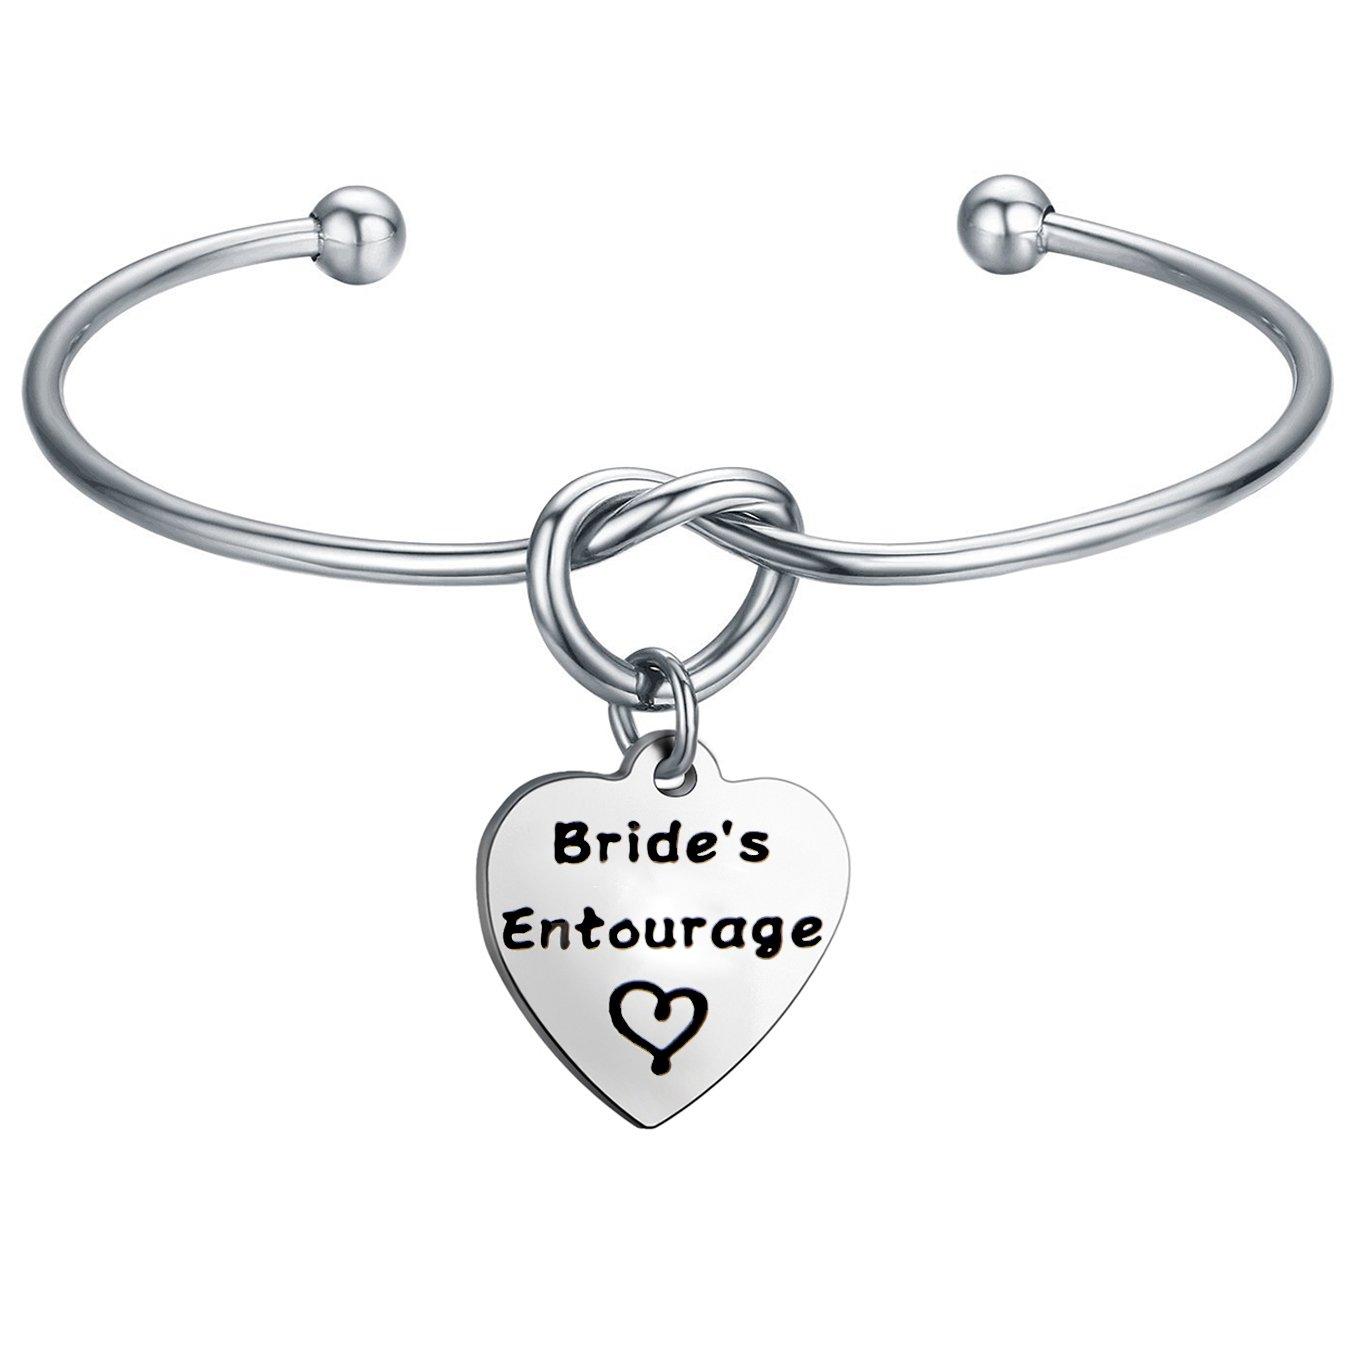 FEELMEM Bride's Entourage Love Knot Bangle Bracelet Wedding Jewelry Bridal Shower Bachelorette Party Gift (silver)